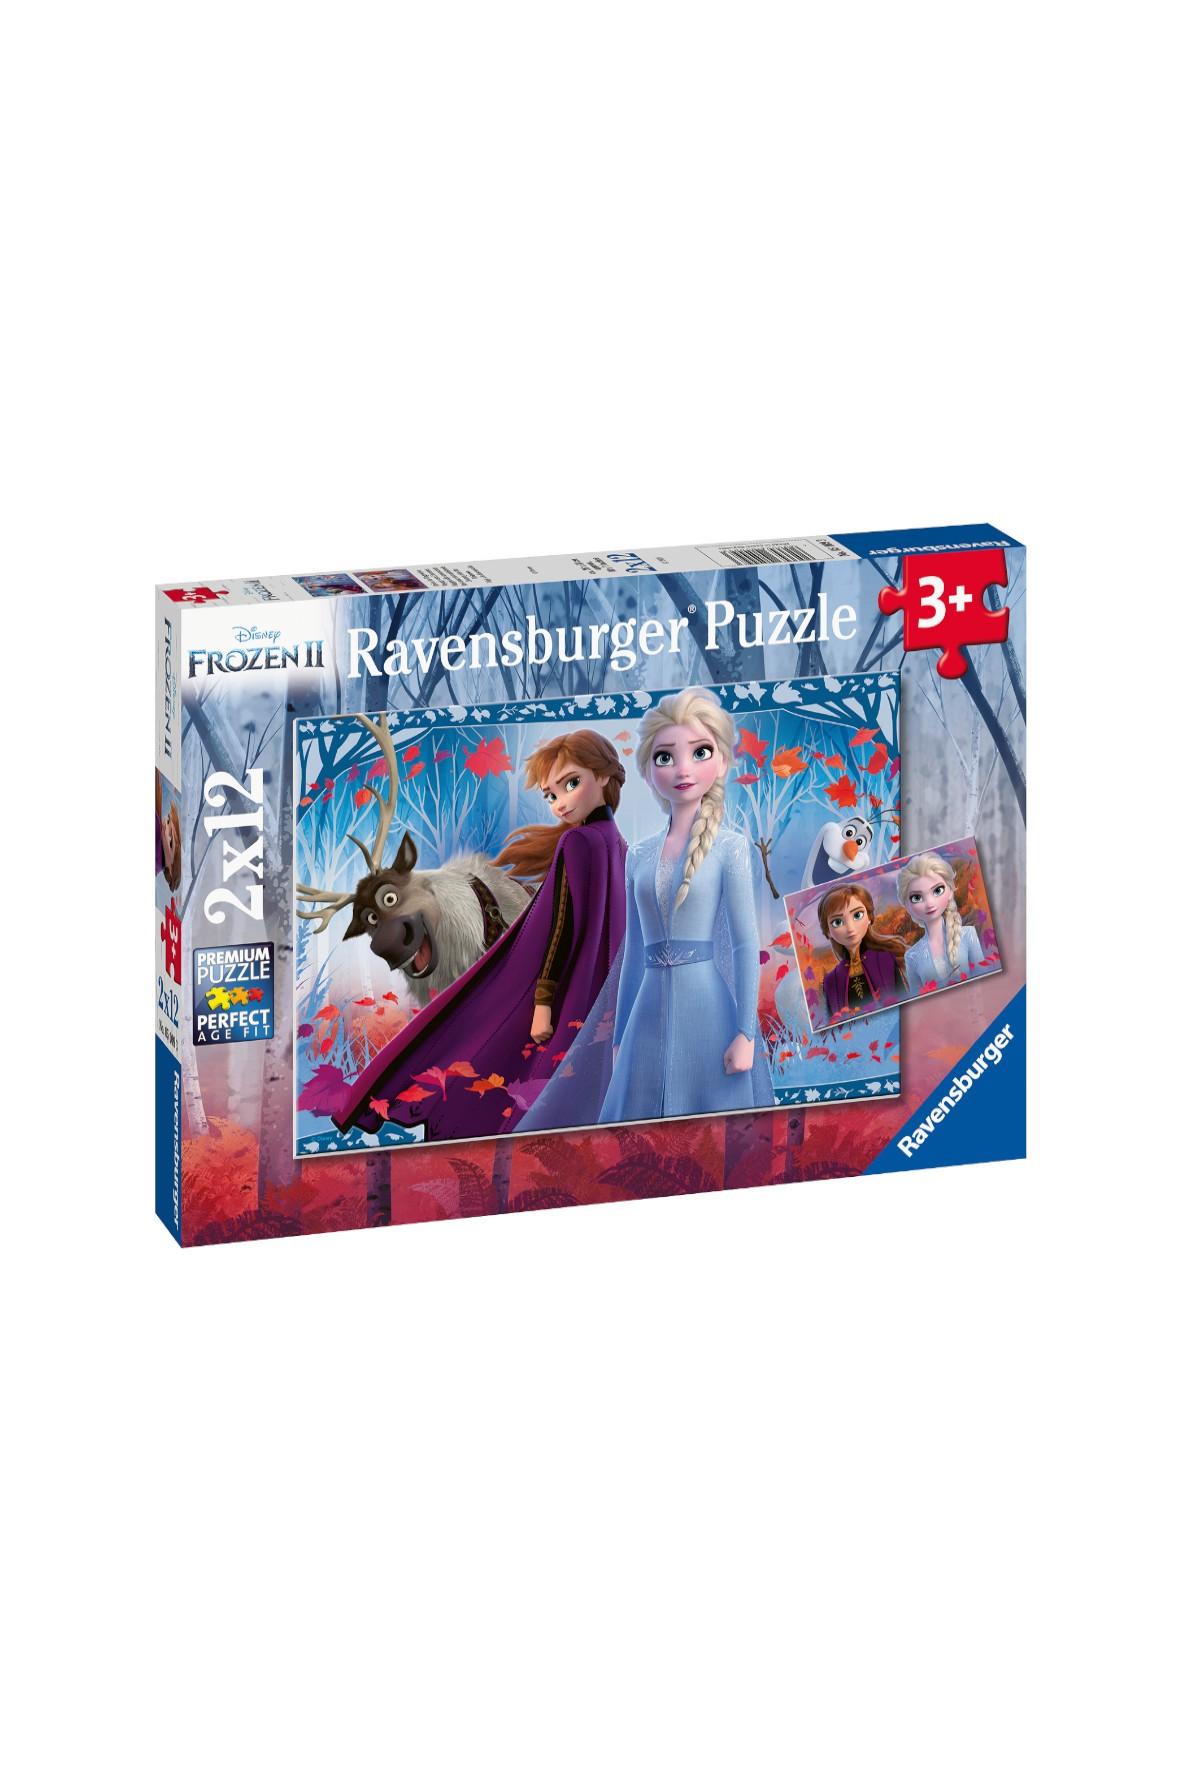 Puzzle Frozen 2 - 2 x 12 elementów wiek 3+